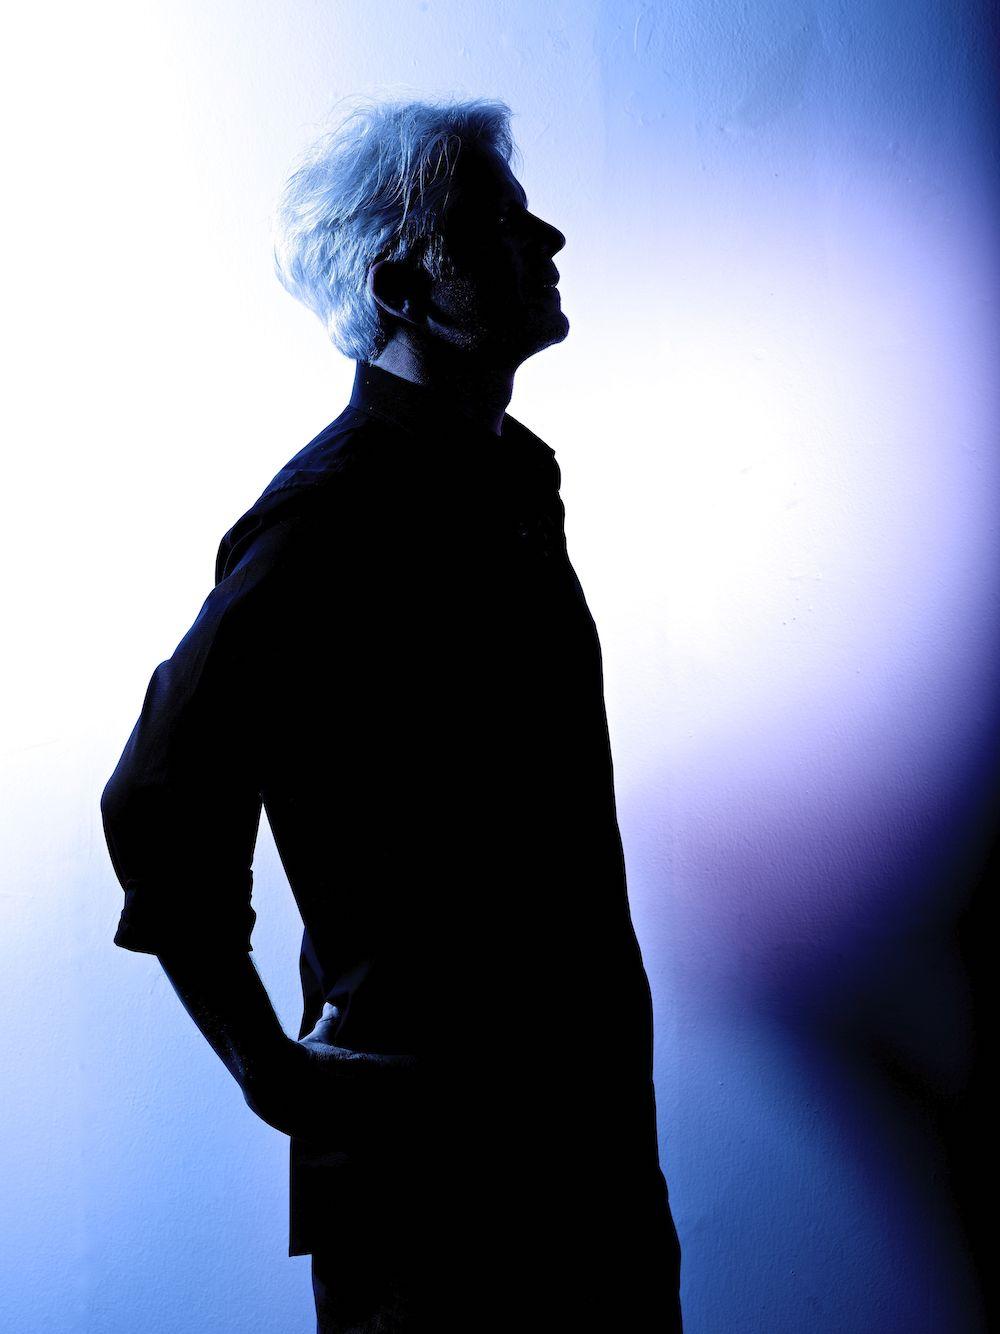 Daniel Leighton Silhouette Portrait by Jeffrey Sklan